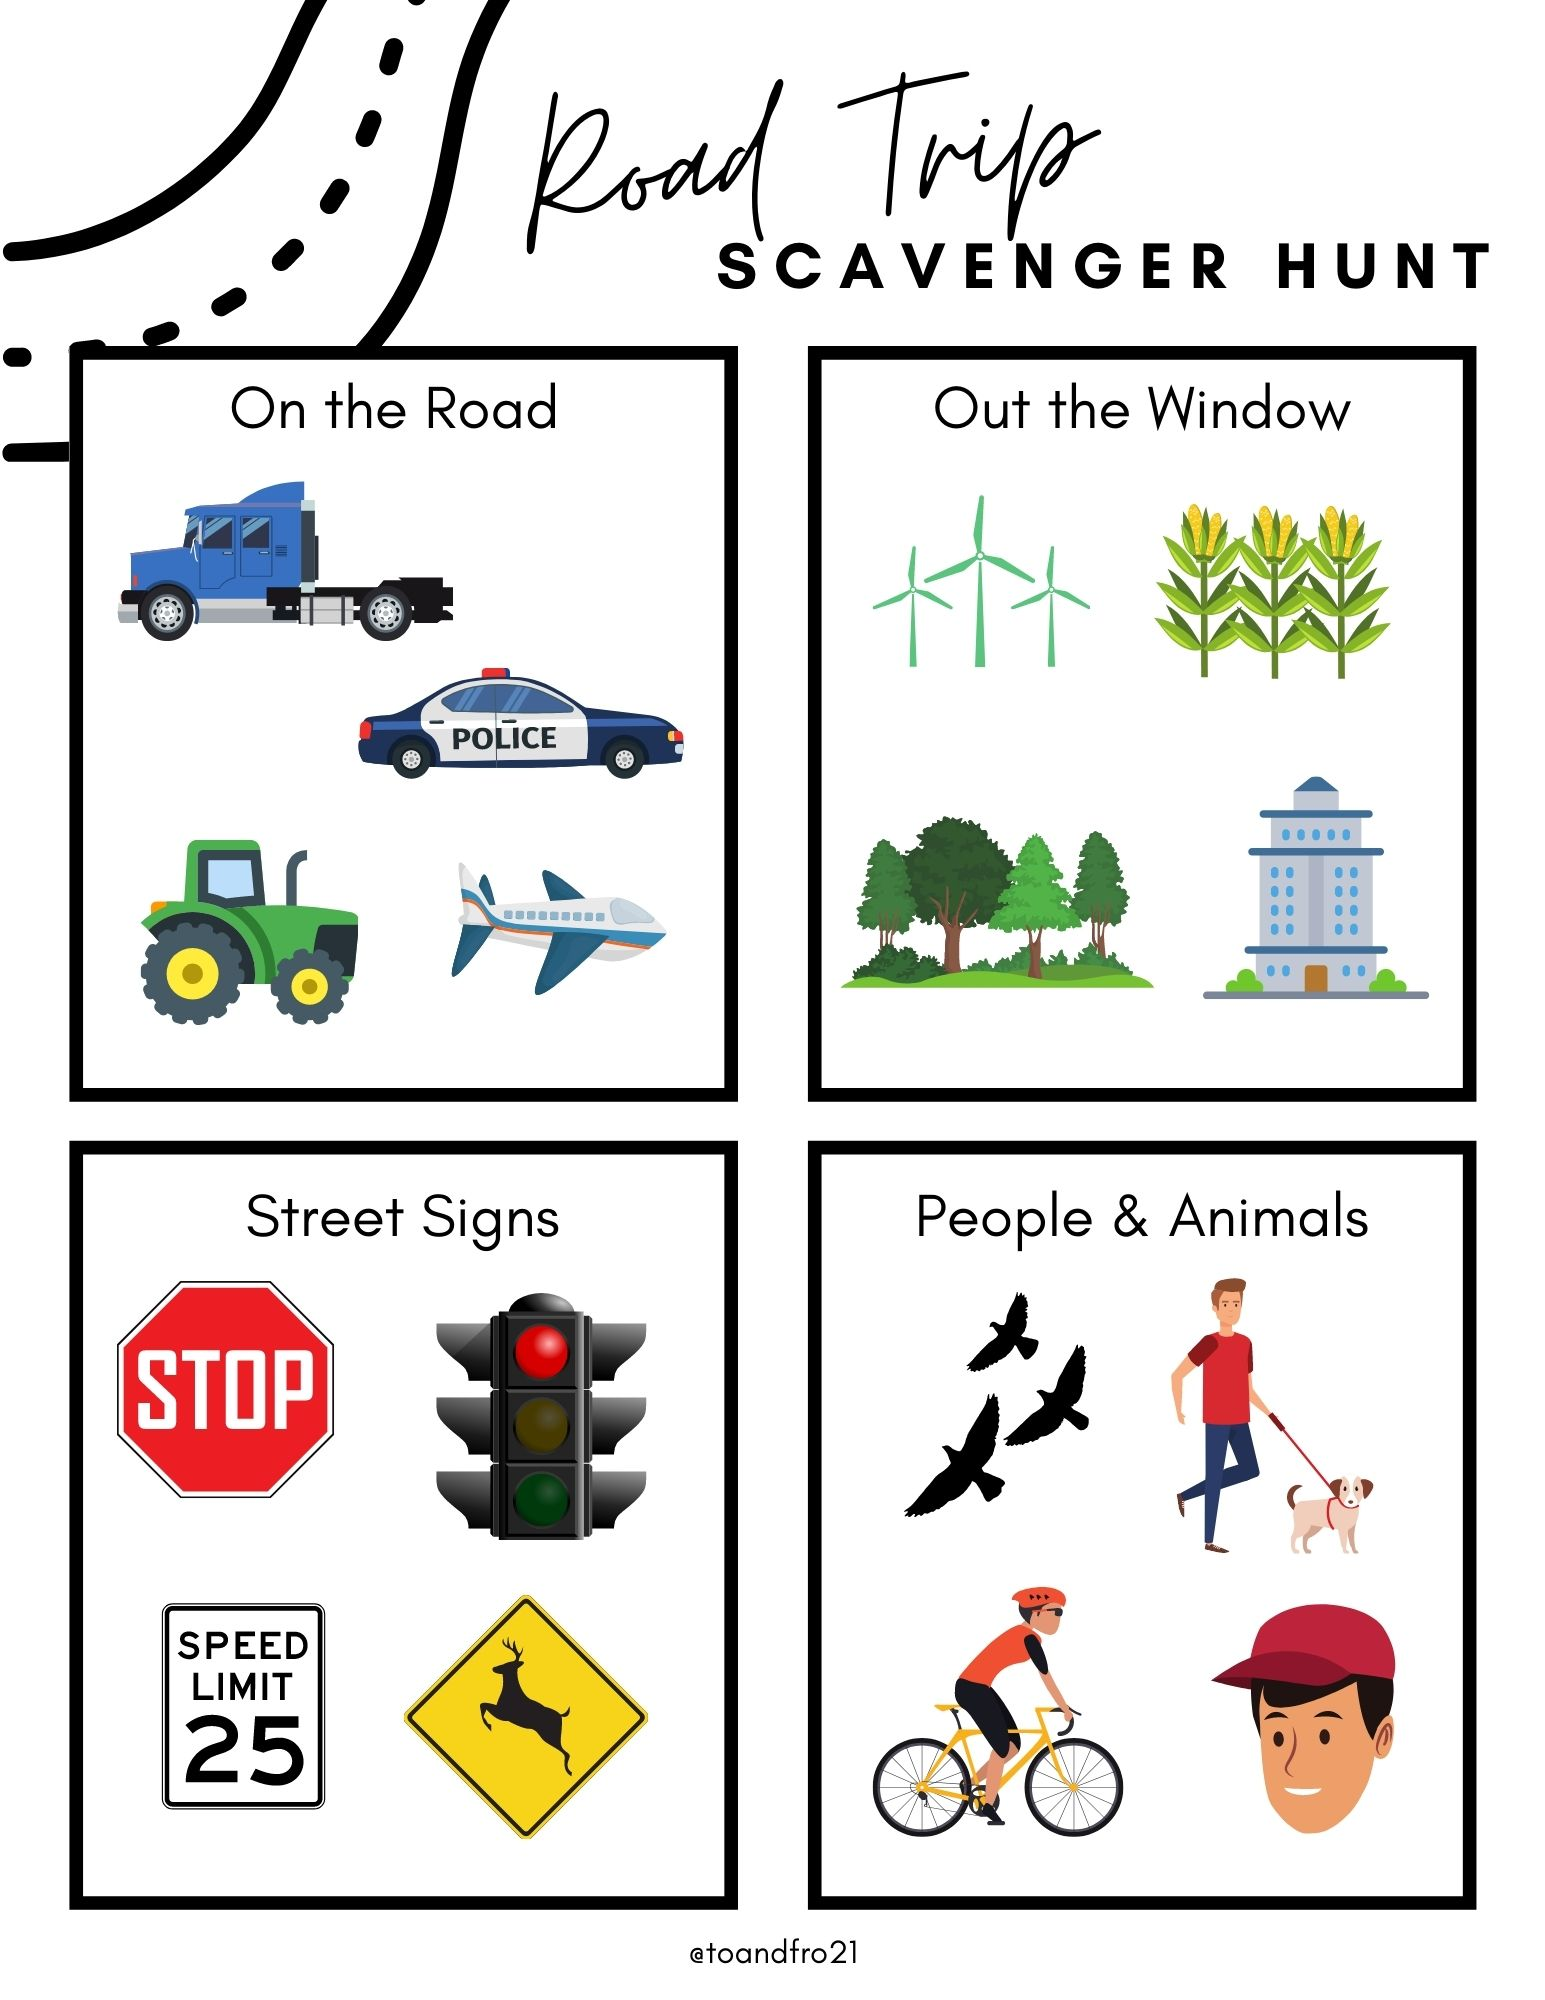 Road Trip Scavenger Hunt for Kids (plus FREE printable)